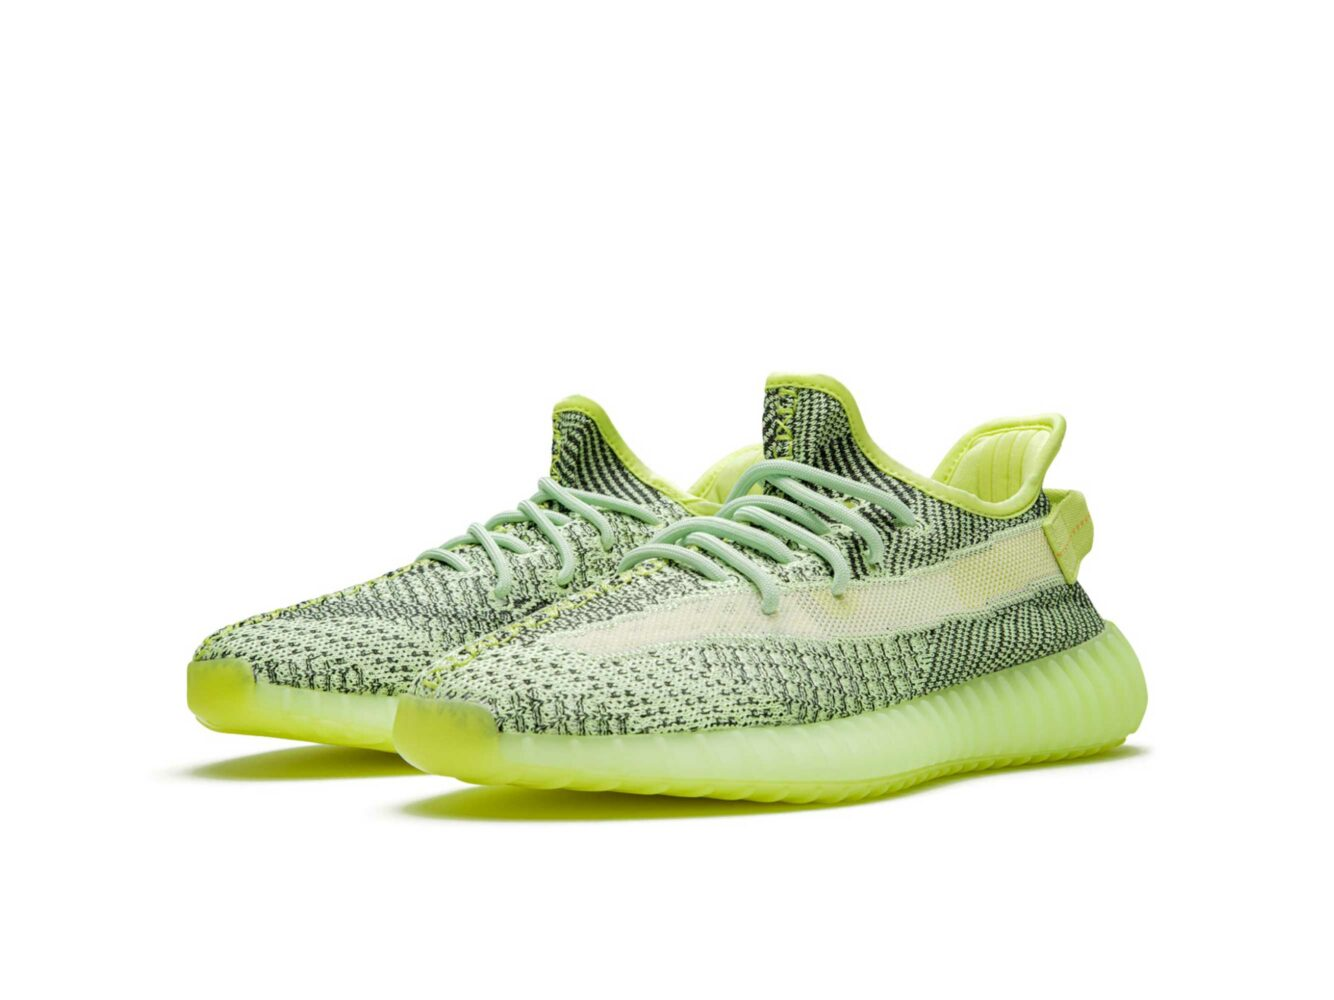 adidas yeezy yeezy boost 350 v2 yeezreel FW5191 купить